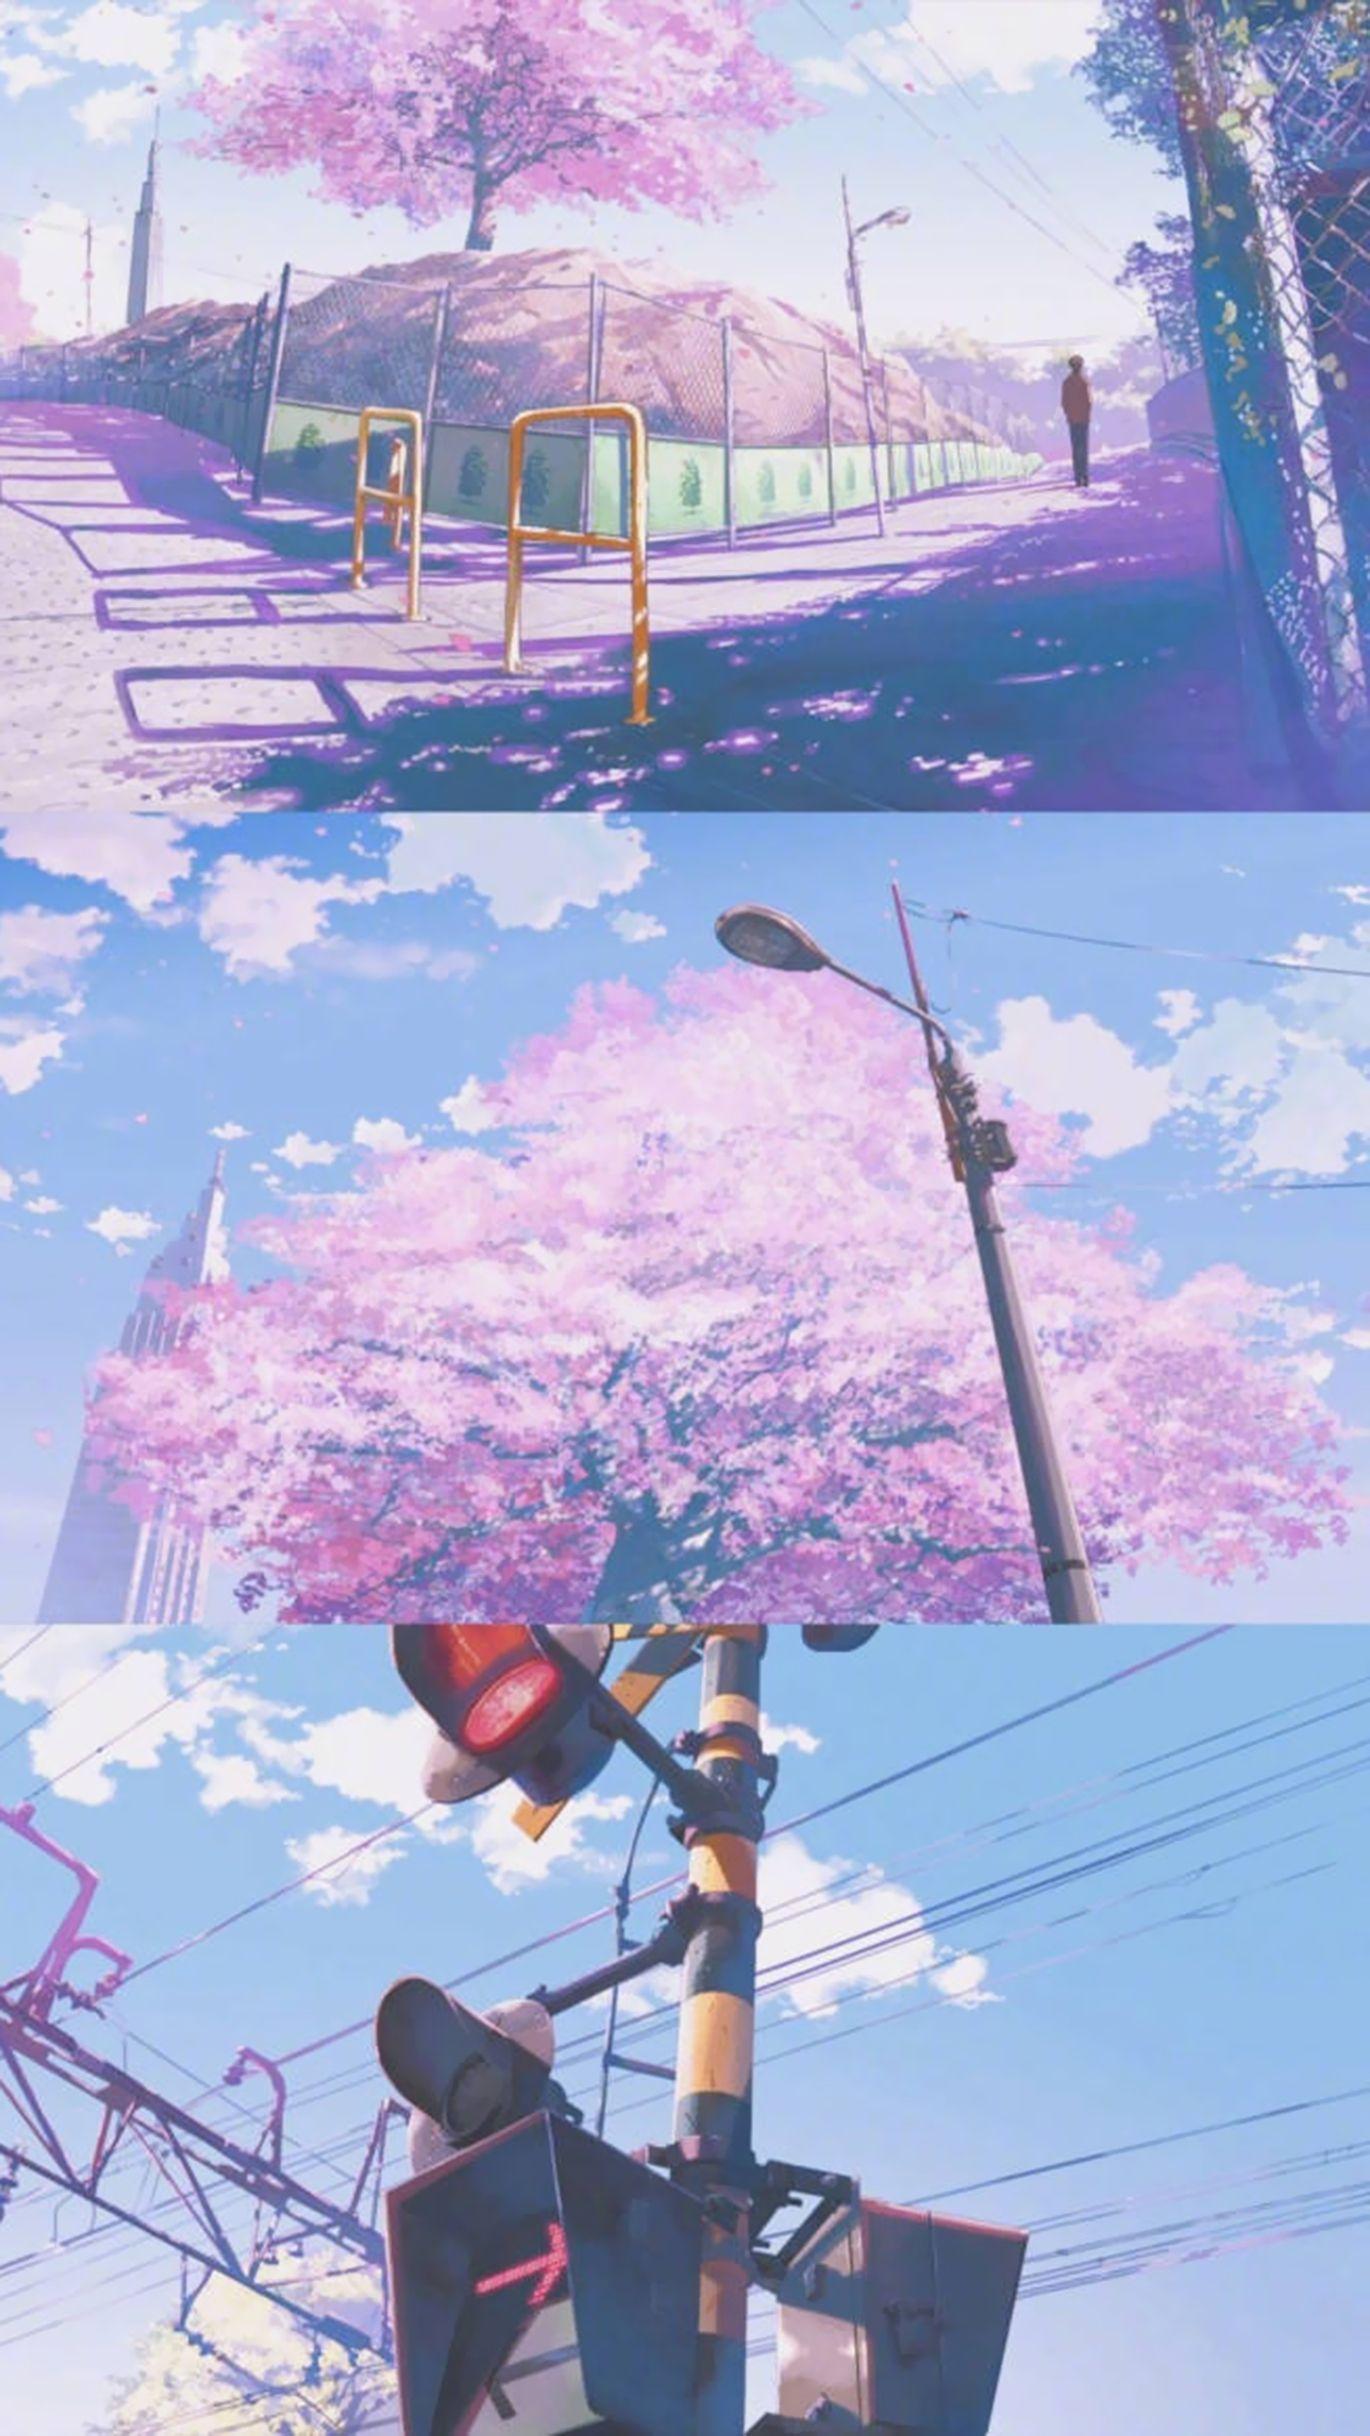 Cherry Blossoms Wallpaper Anime Scenery Wallpaper Anime Backgrounds Wallpapers Anime Scenery